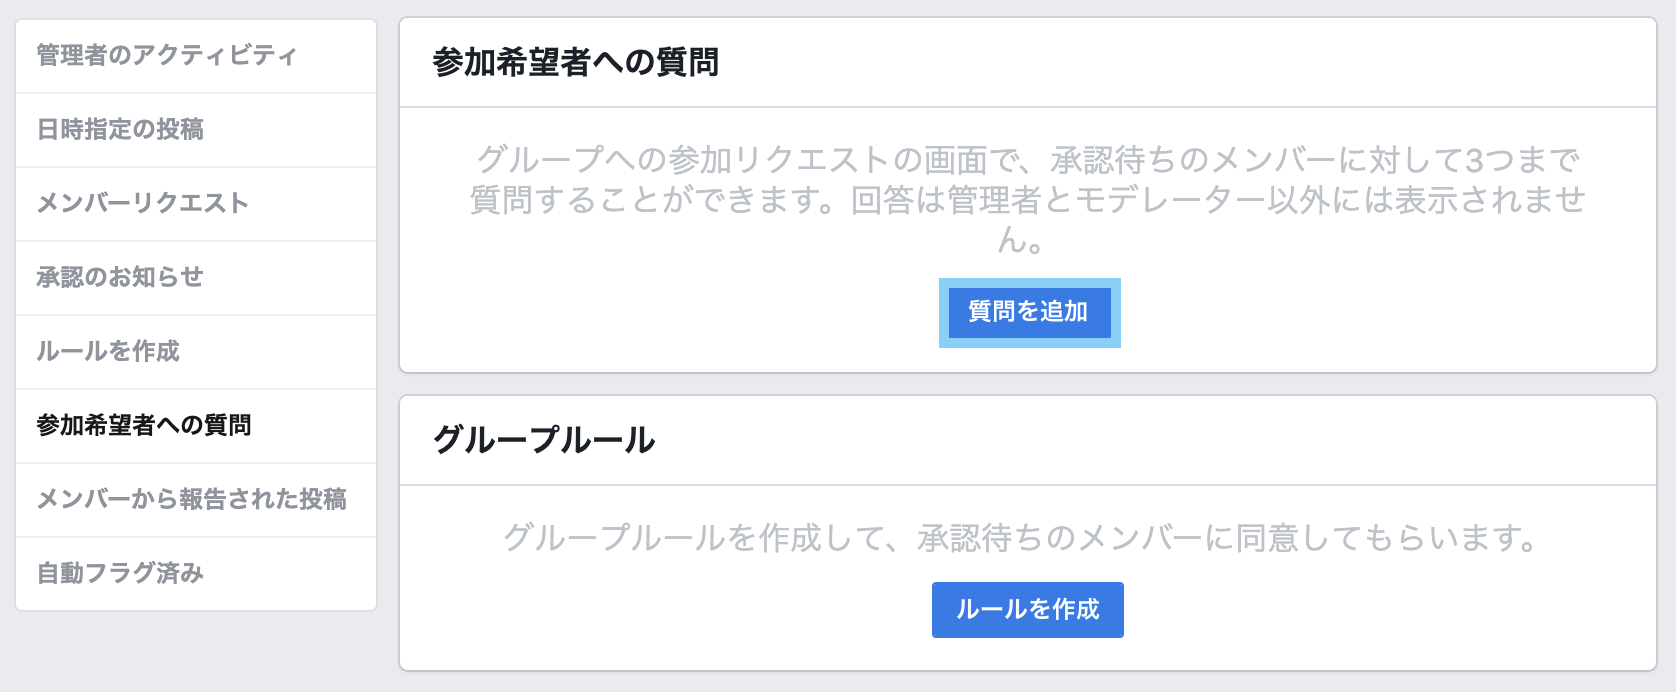 Facebookグループ 質問